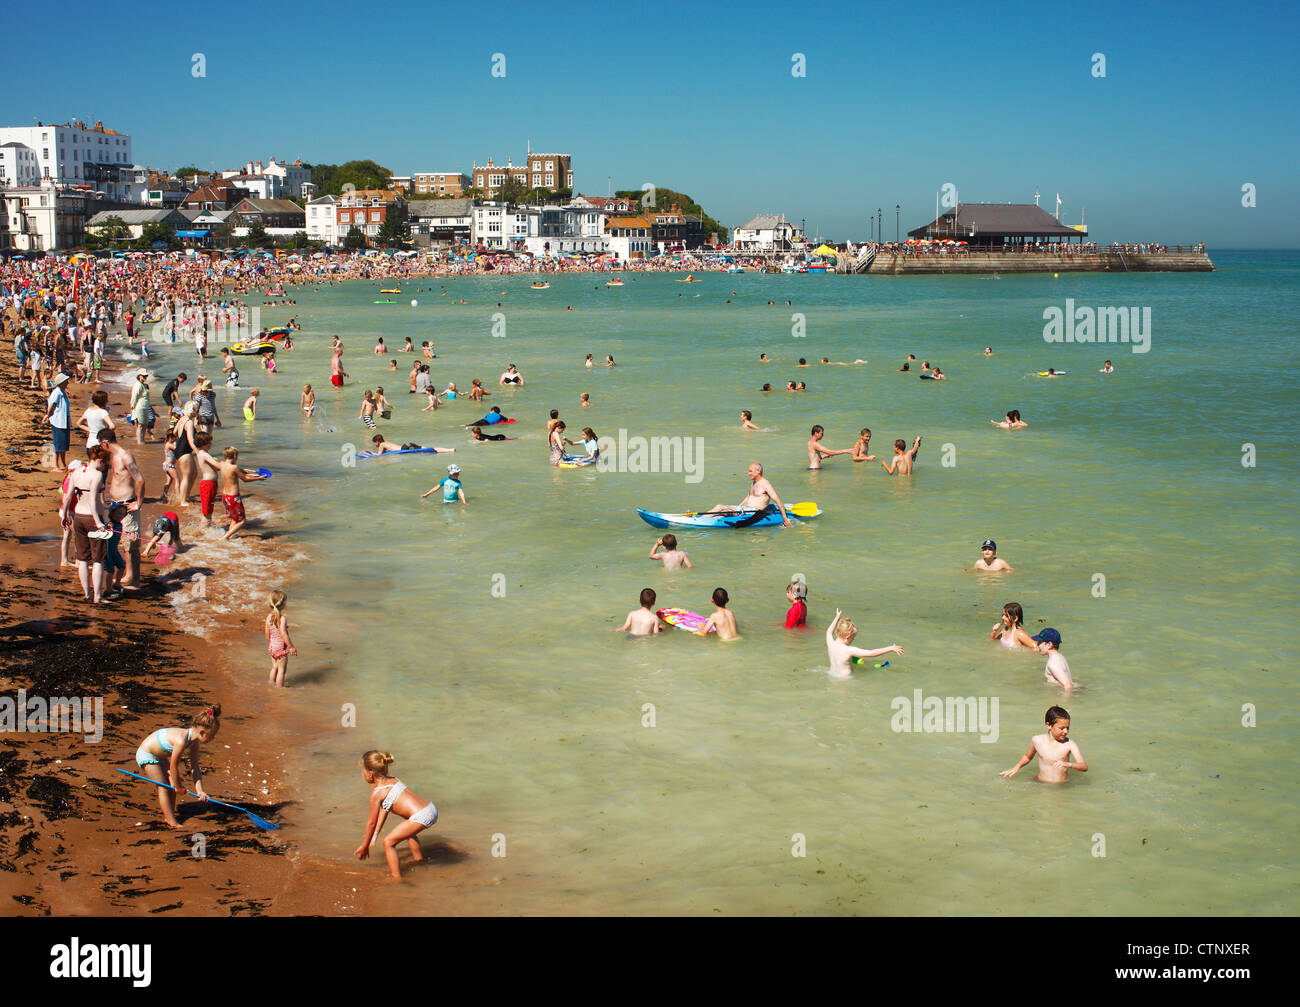 Broadstairs seaside resort. - Stock Image